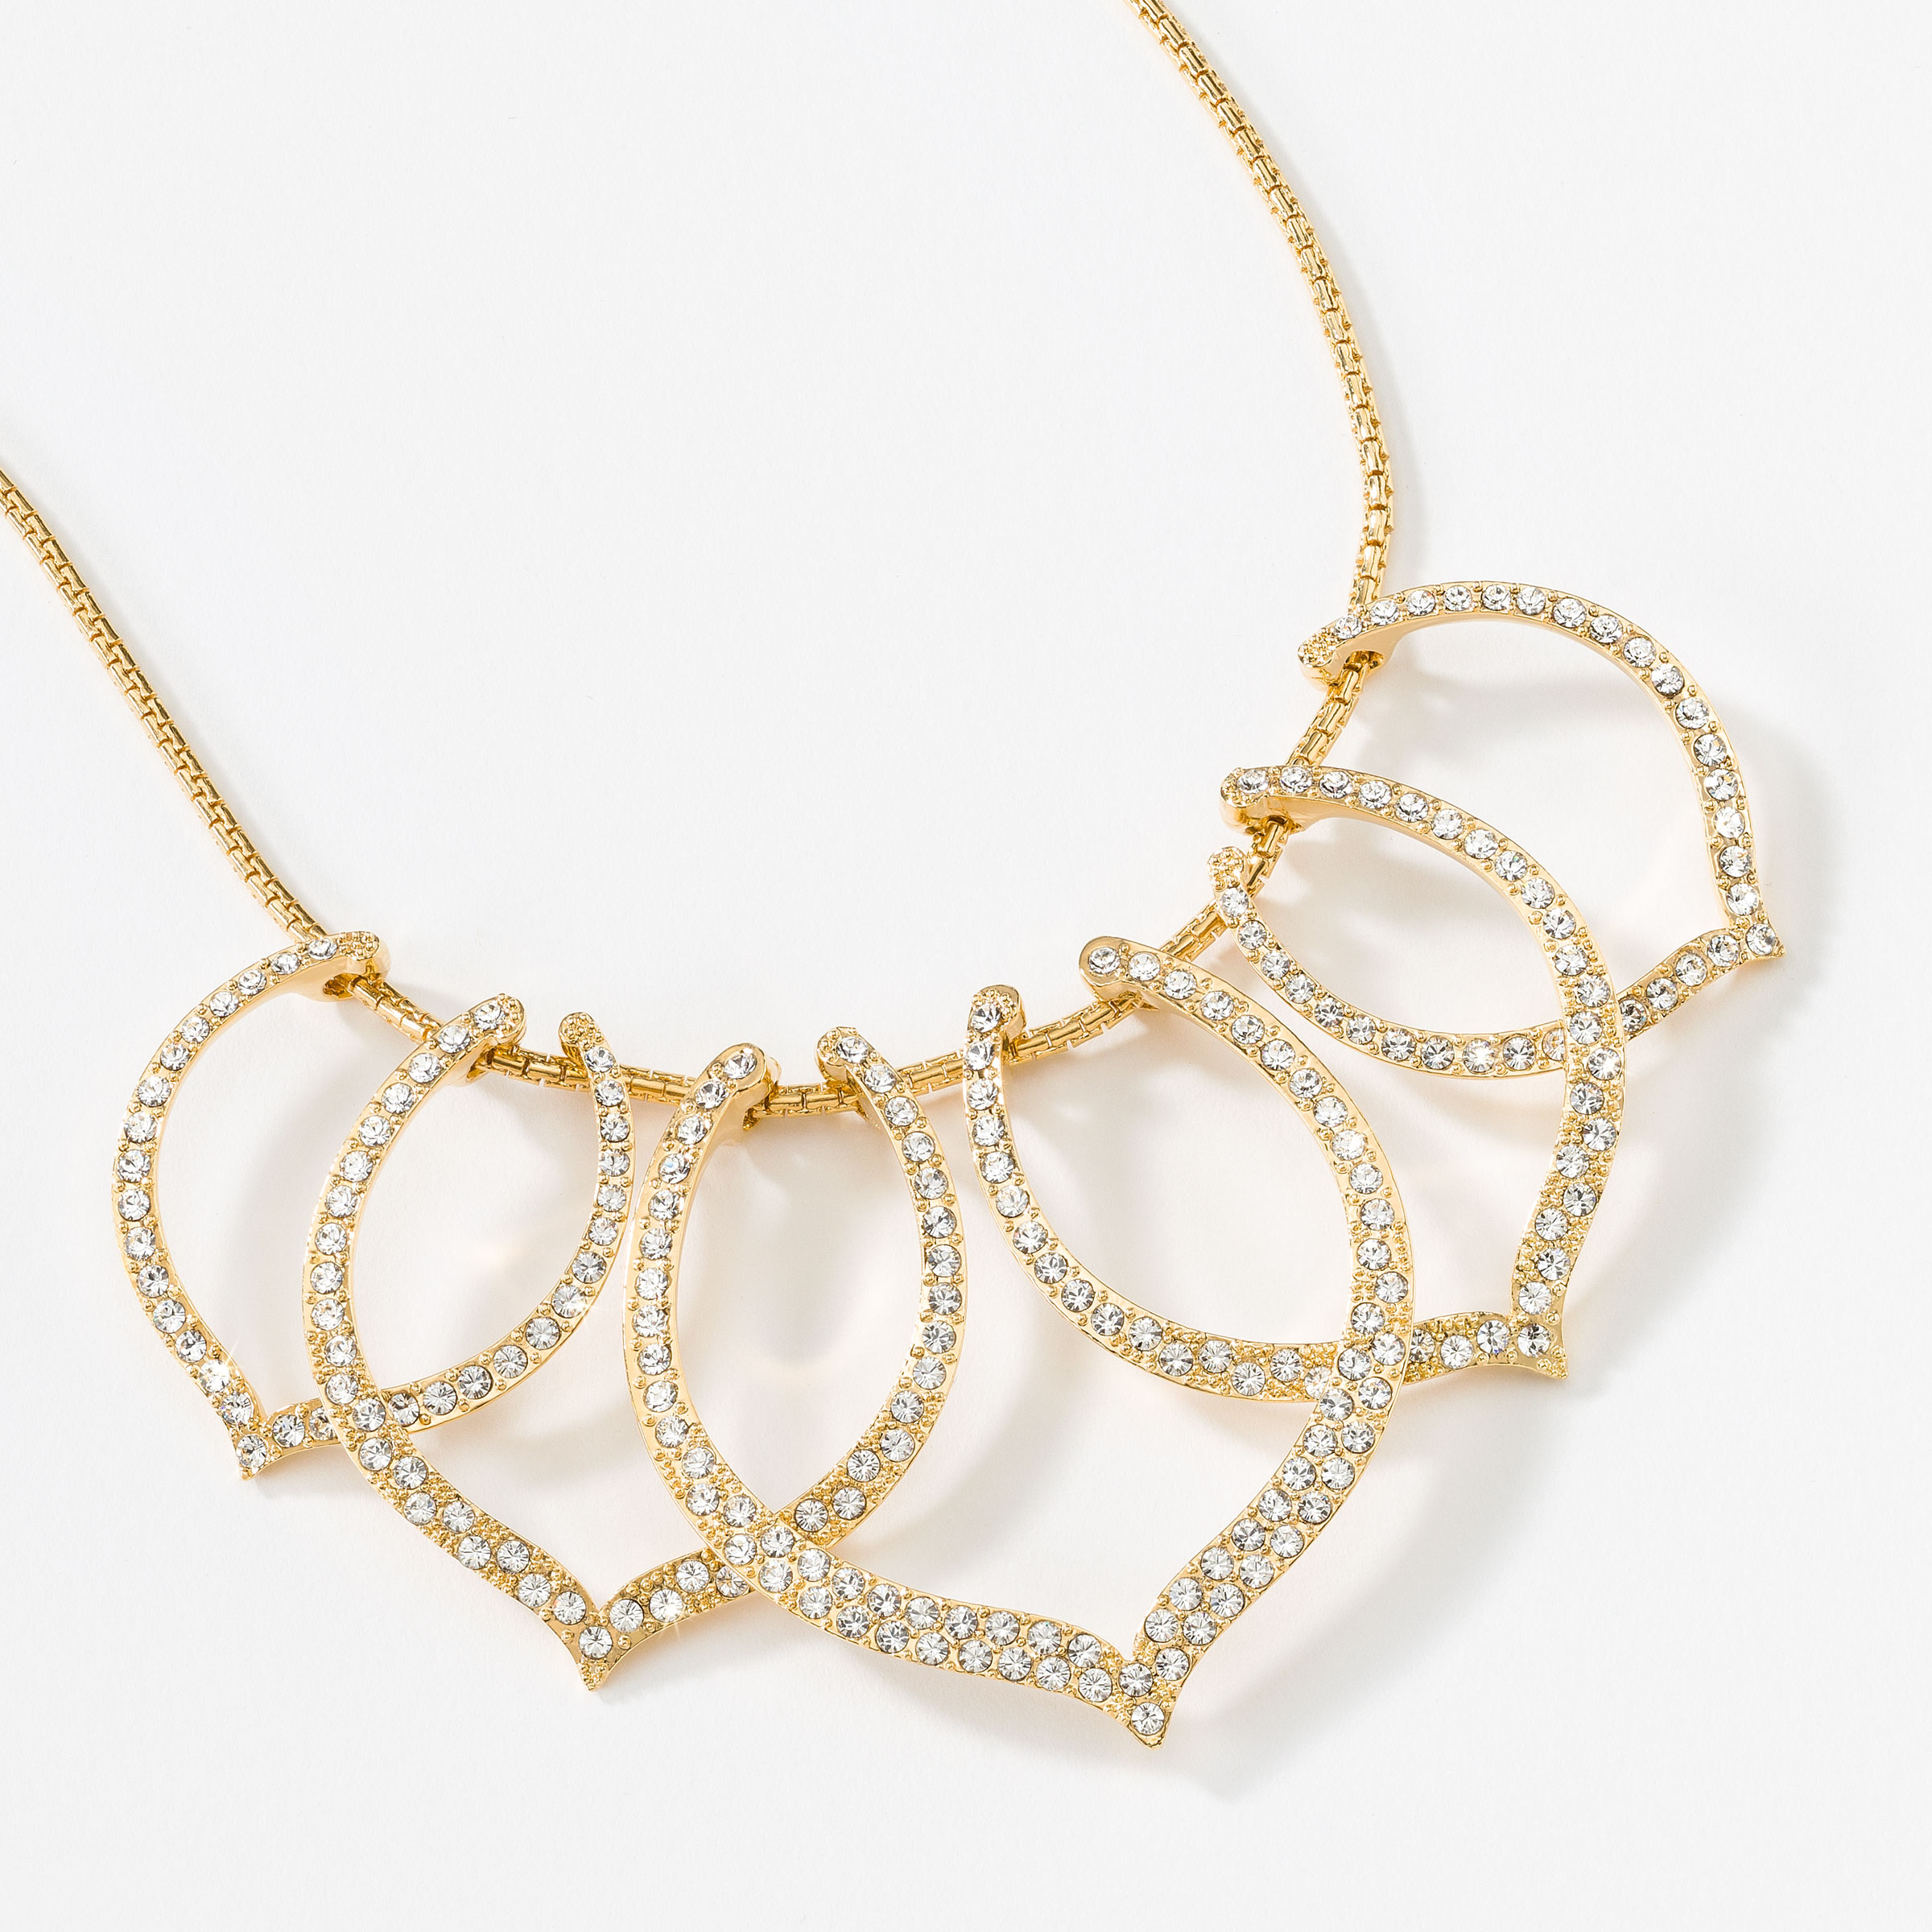 Touchstone Crystal by Swarovski – Jewelry Home Parties ae01902383